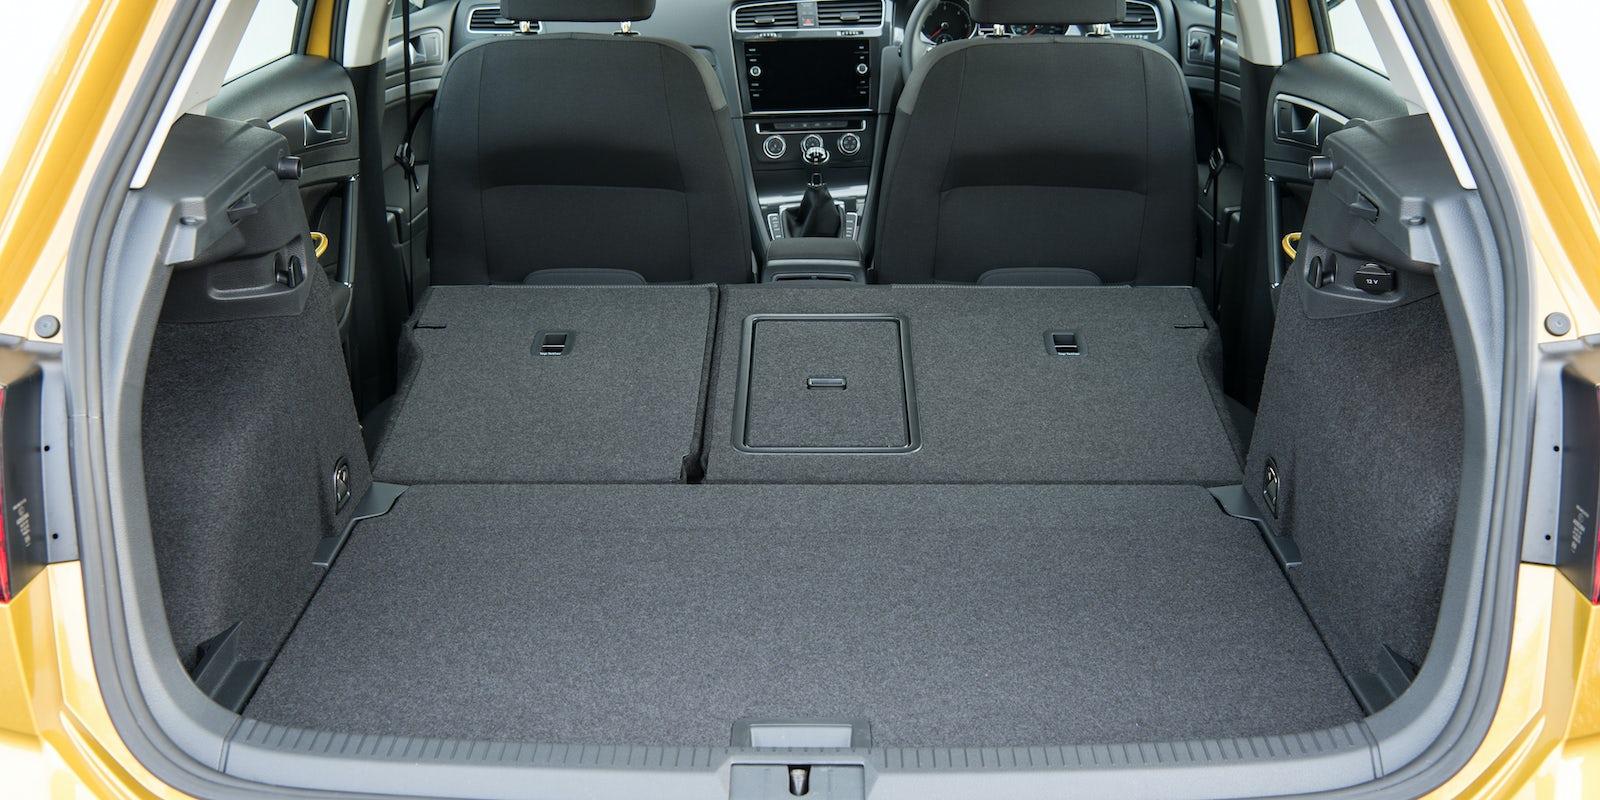 volkswagen golf review carwow. Black Bedroom Furniture Sets. Home Design Ideas